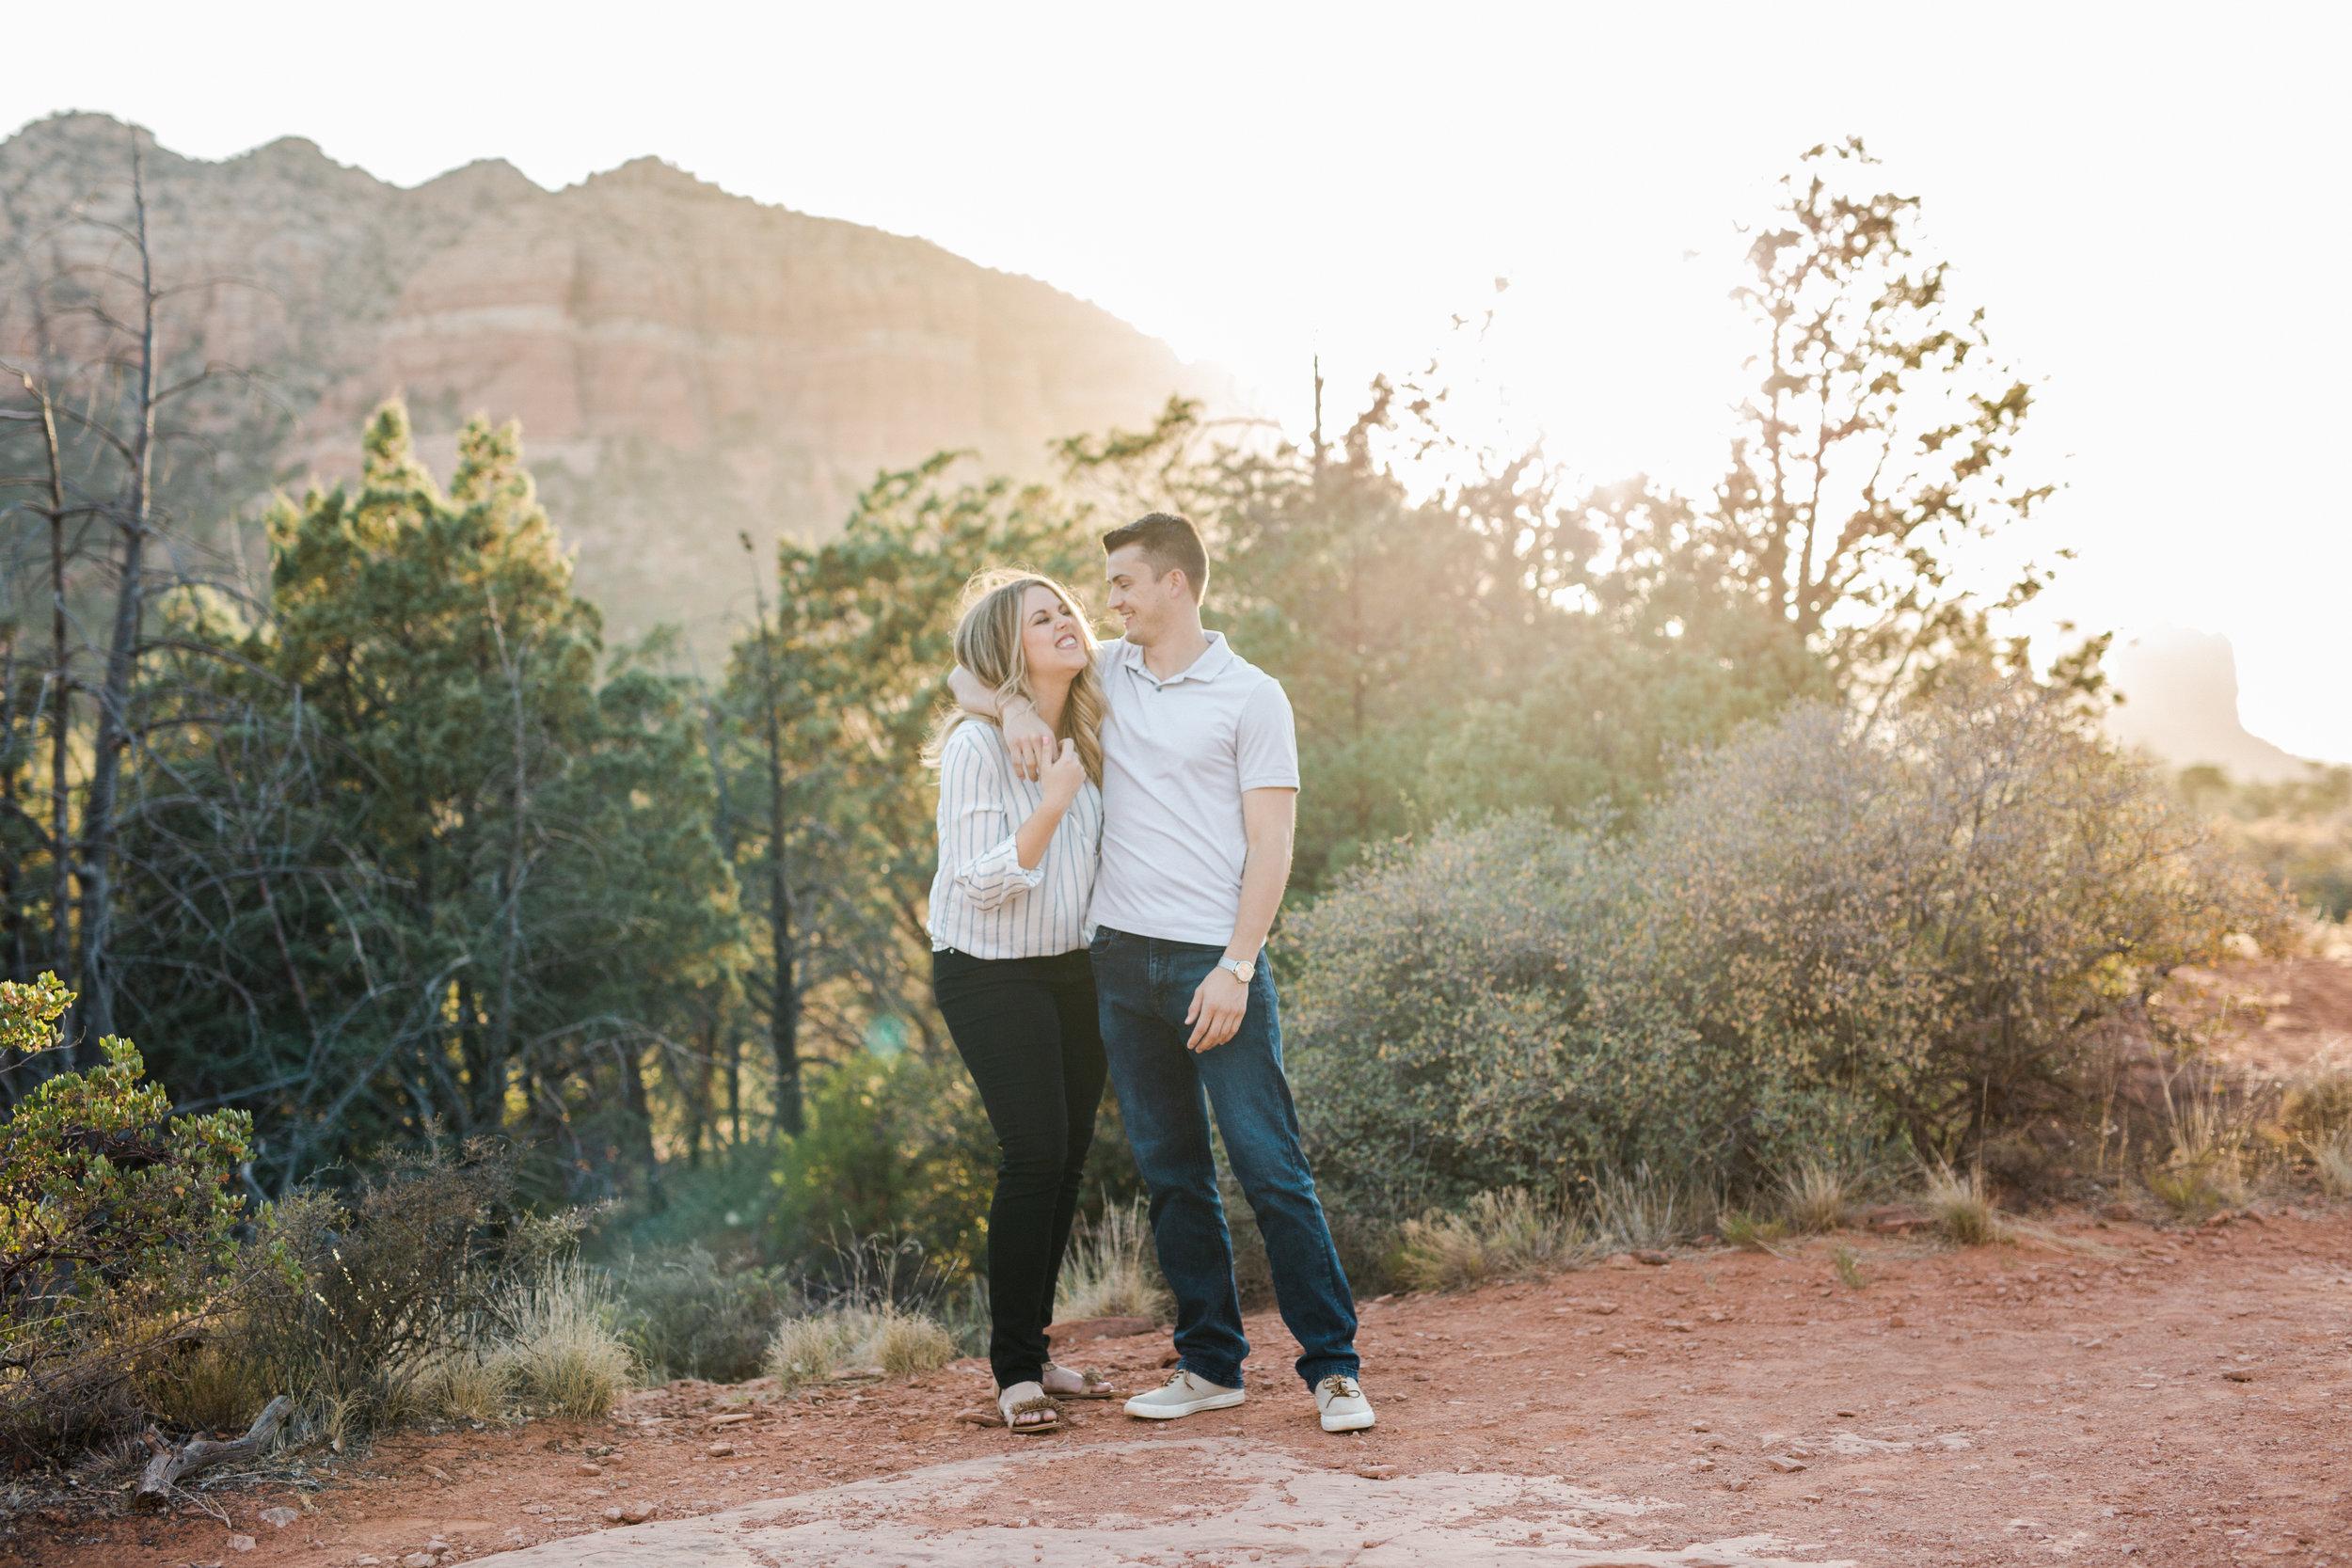 EngagementPhotos-108.jpg